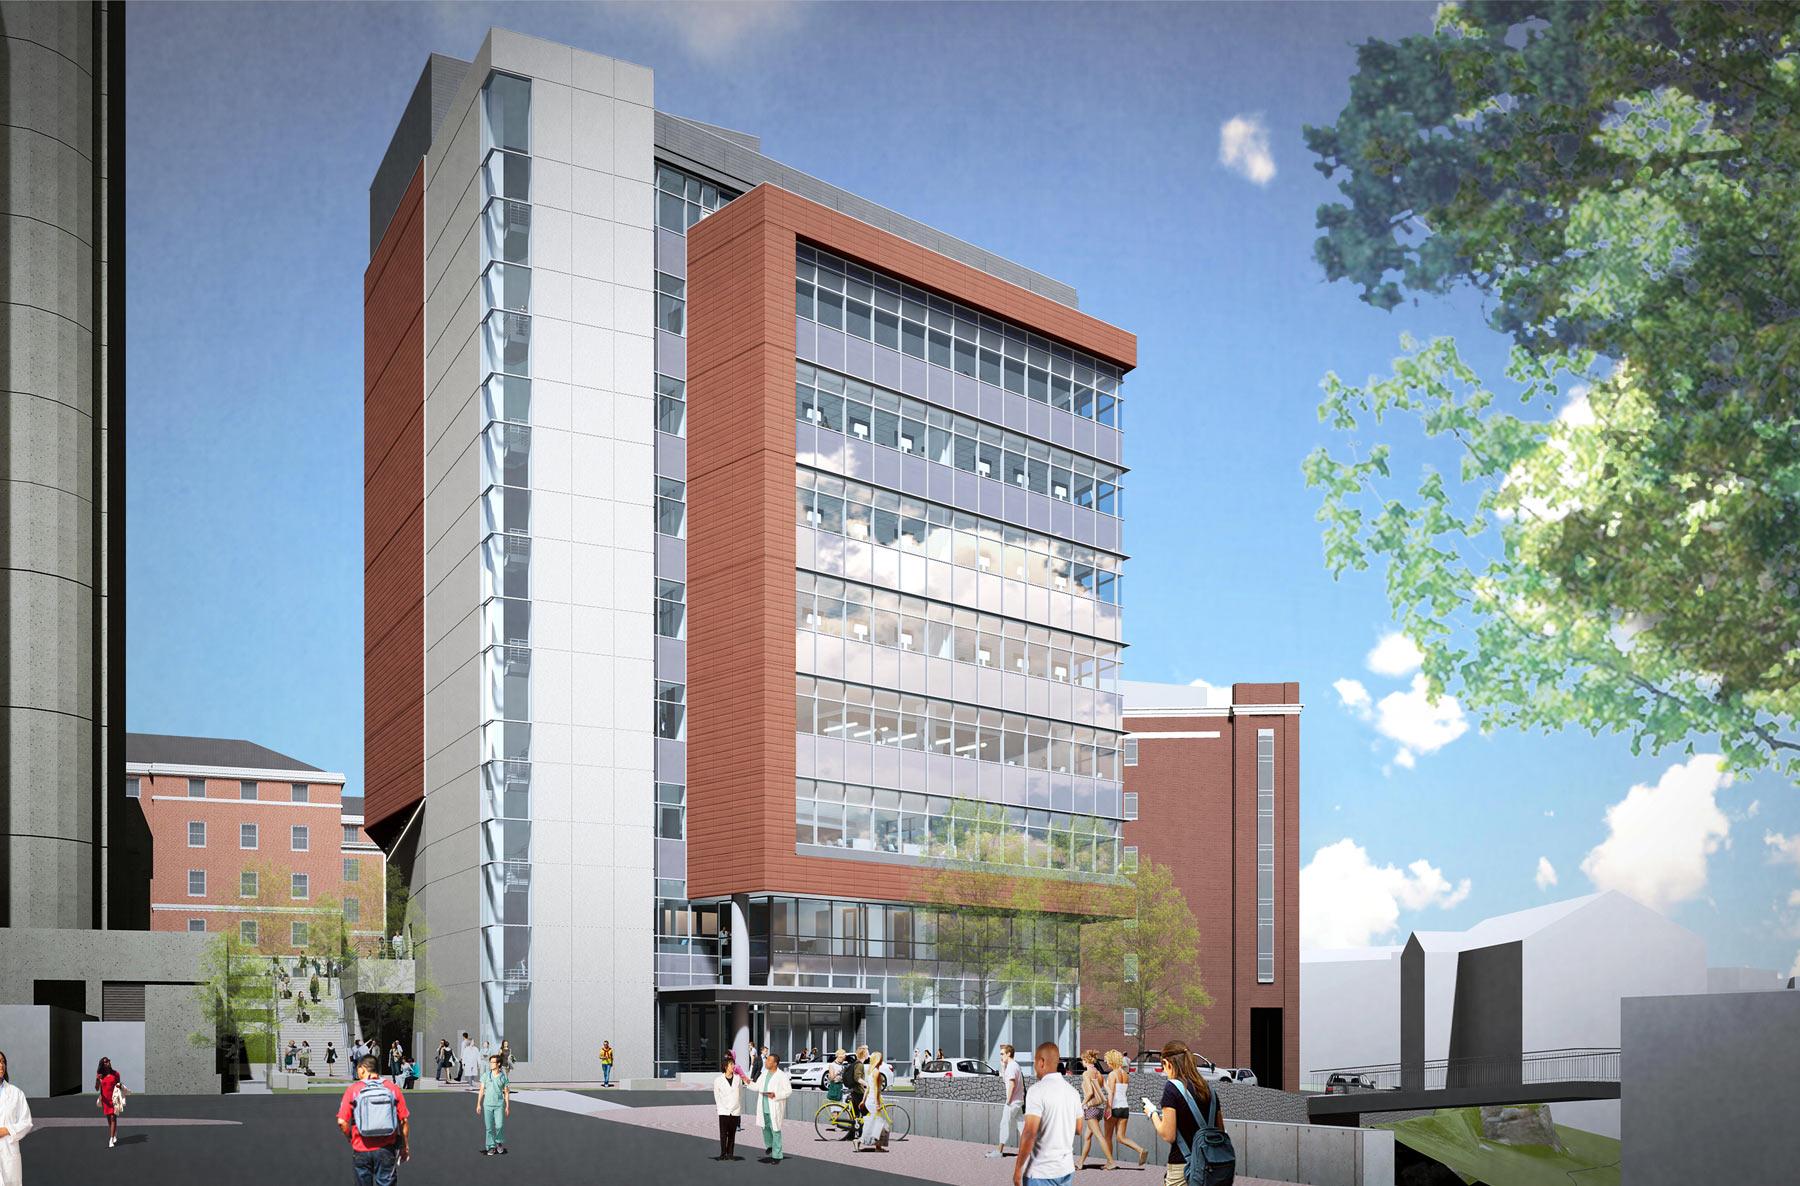 University of North Carolina - School of Medicine, Medical Education Building